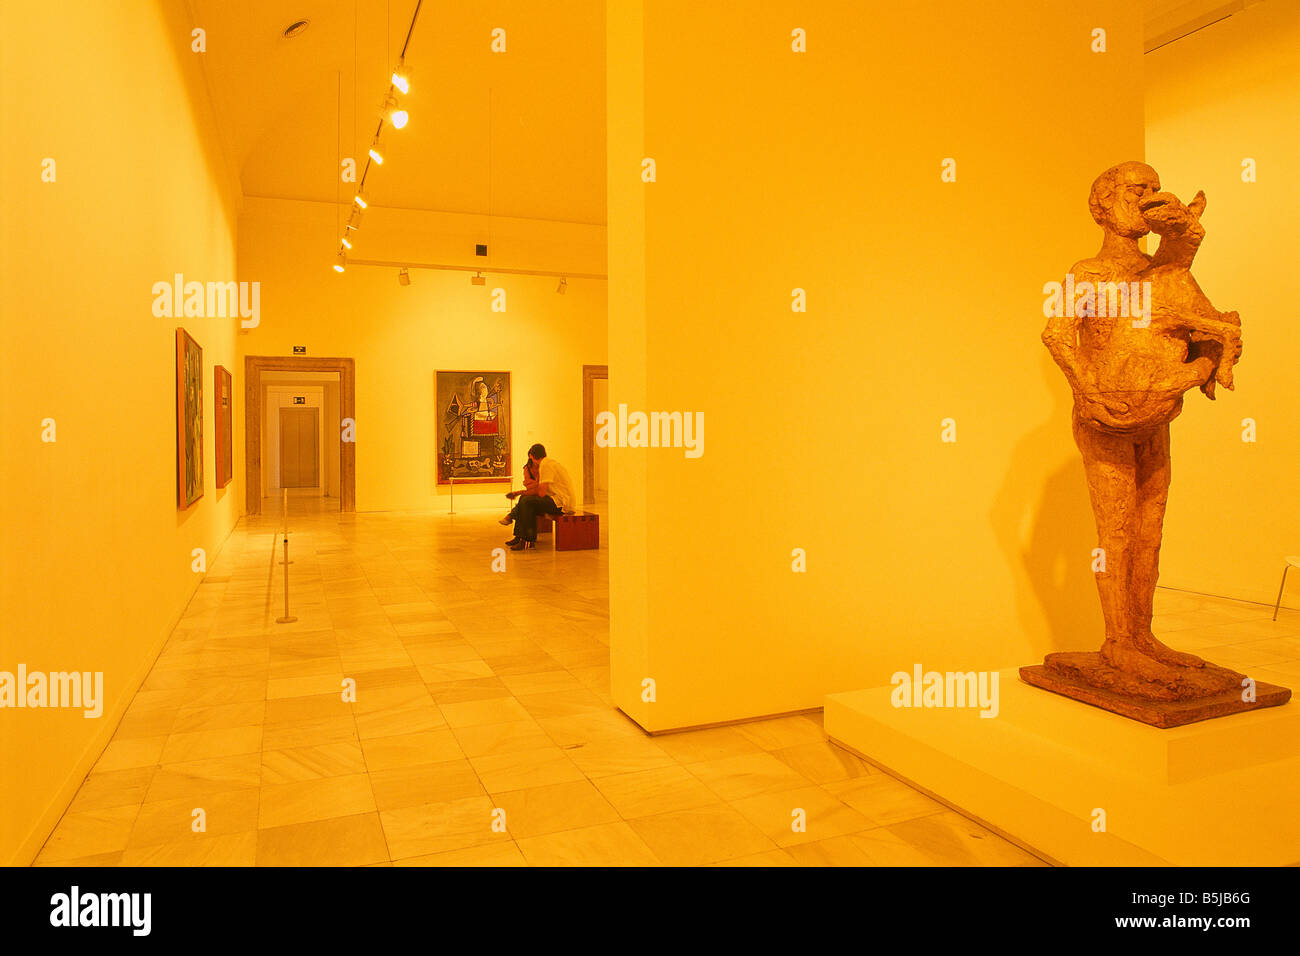 Spanien   Madrid   Königin Sofia Kunst Mitte   Museum Der Moderne Des 20.  Jahrhunderts   Kunst